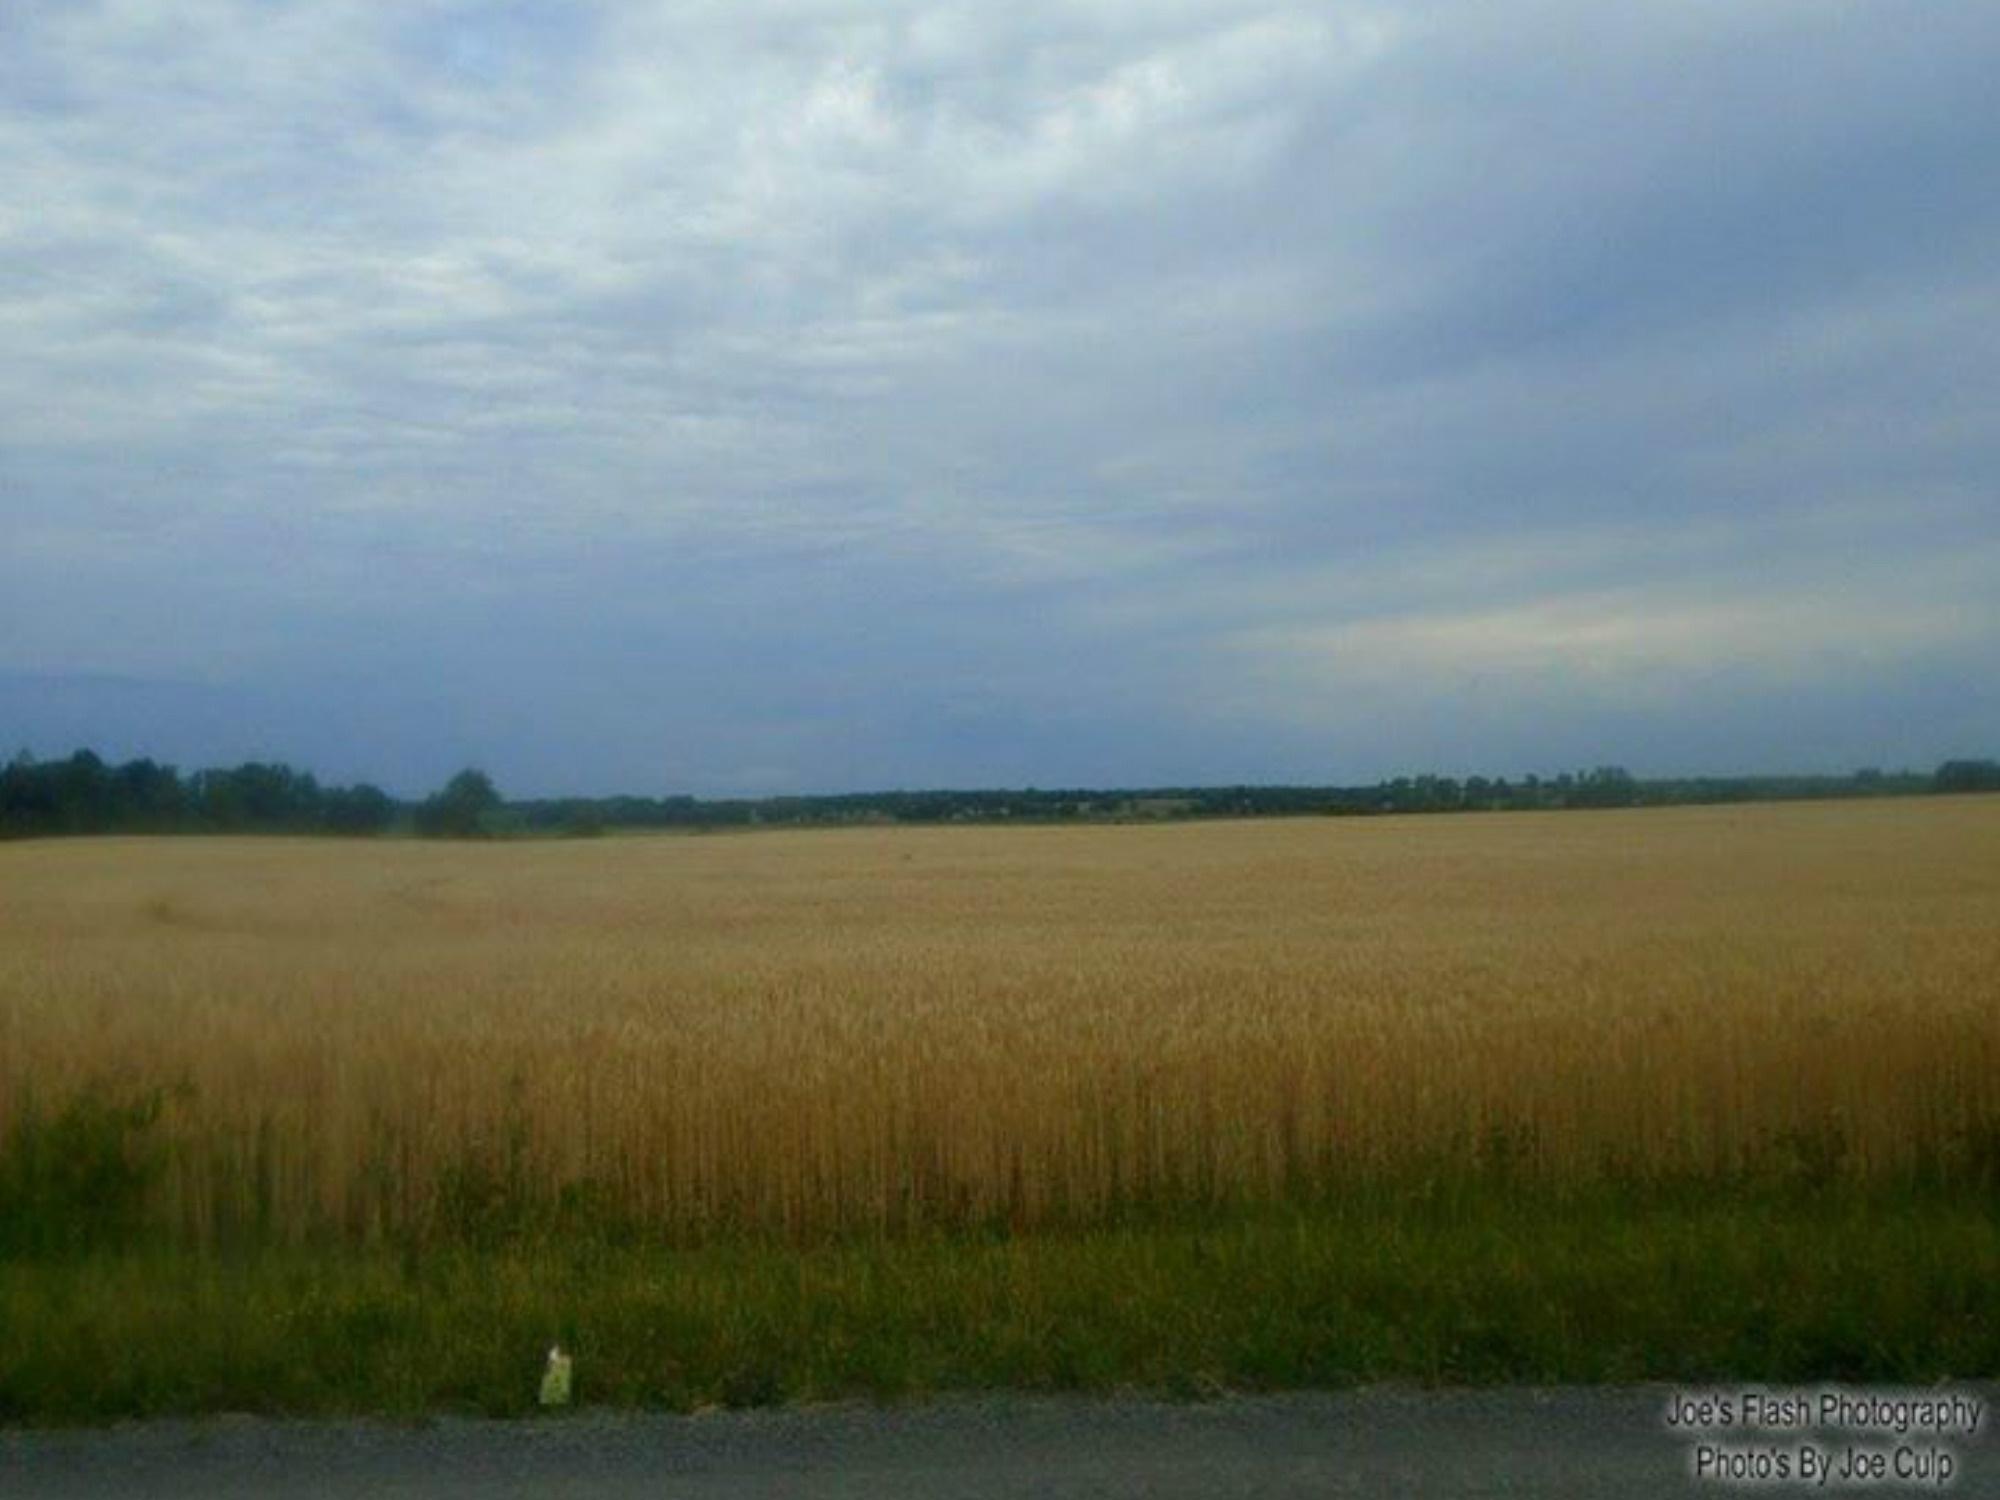 Rainclouds over the wheatfields of prince Edward county by Joe's Flash Photography...Photo's By Joe Culp